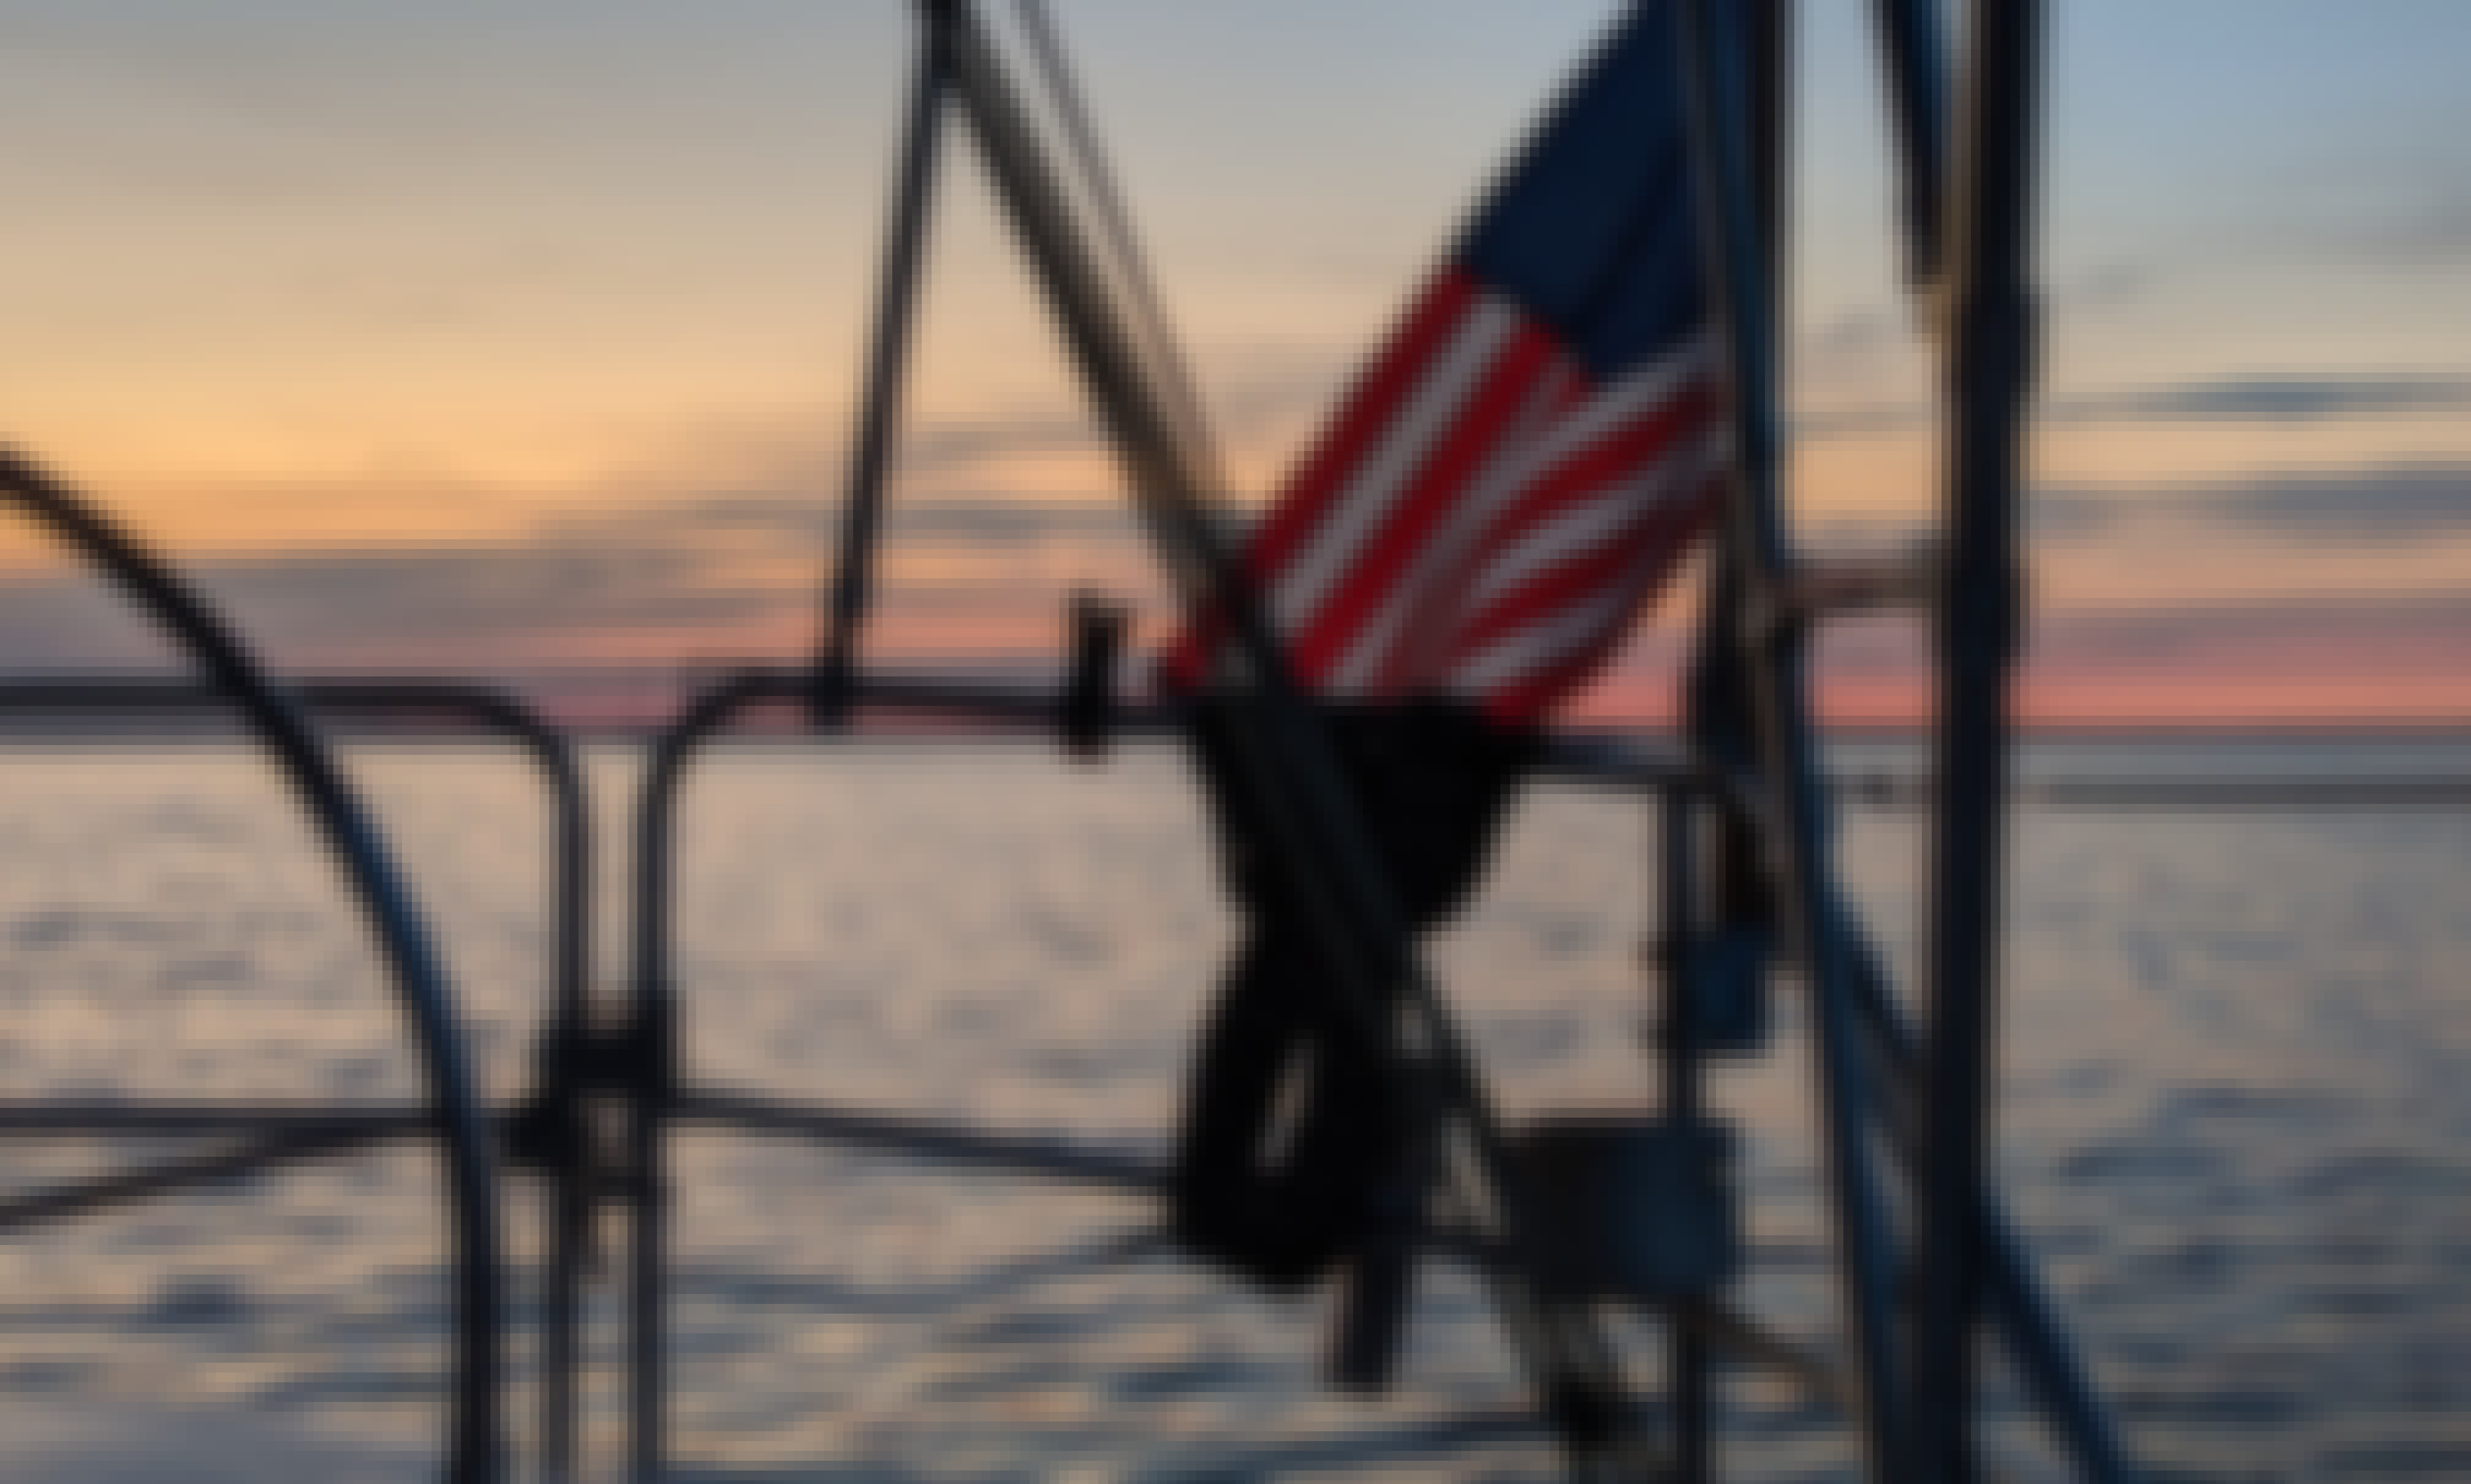 Sail Away Barnegat Bay! Book the 3-Hour Sail Tour with 35' Sailboat